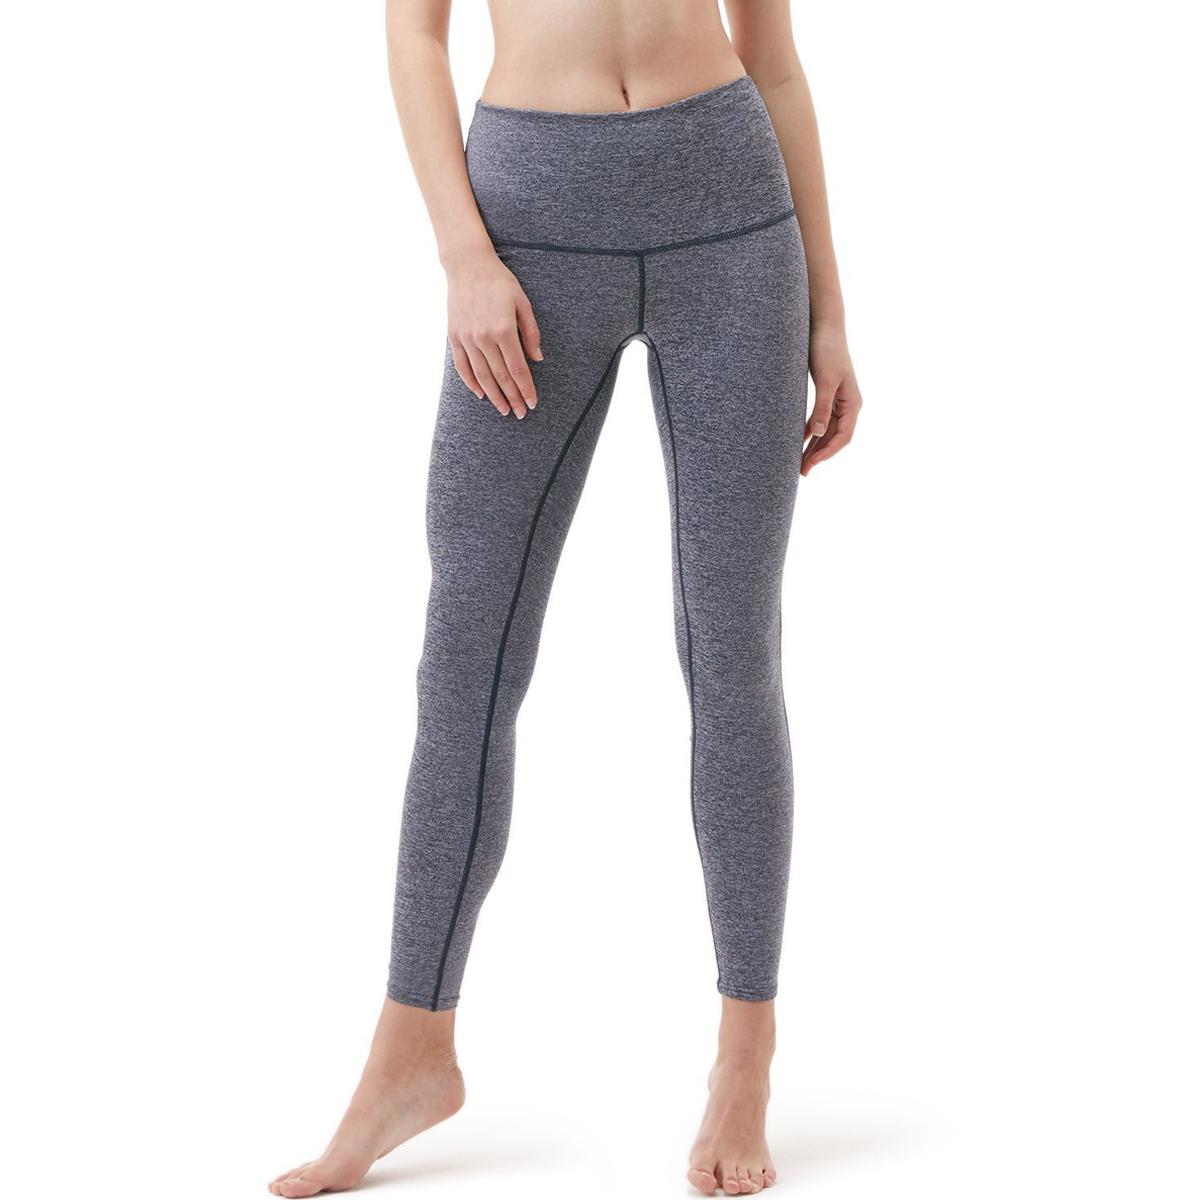 thumbnail 86 - TSLA Tesla FYP42 Women's High-Waisted Ultra-Stretch Tummy Control Yoga Pants